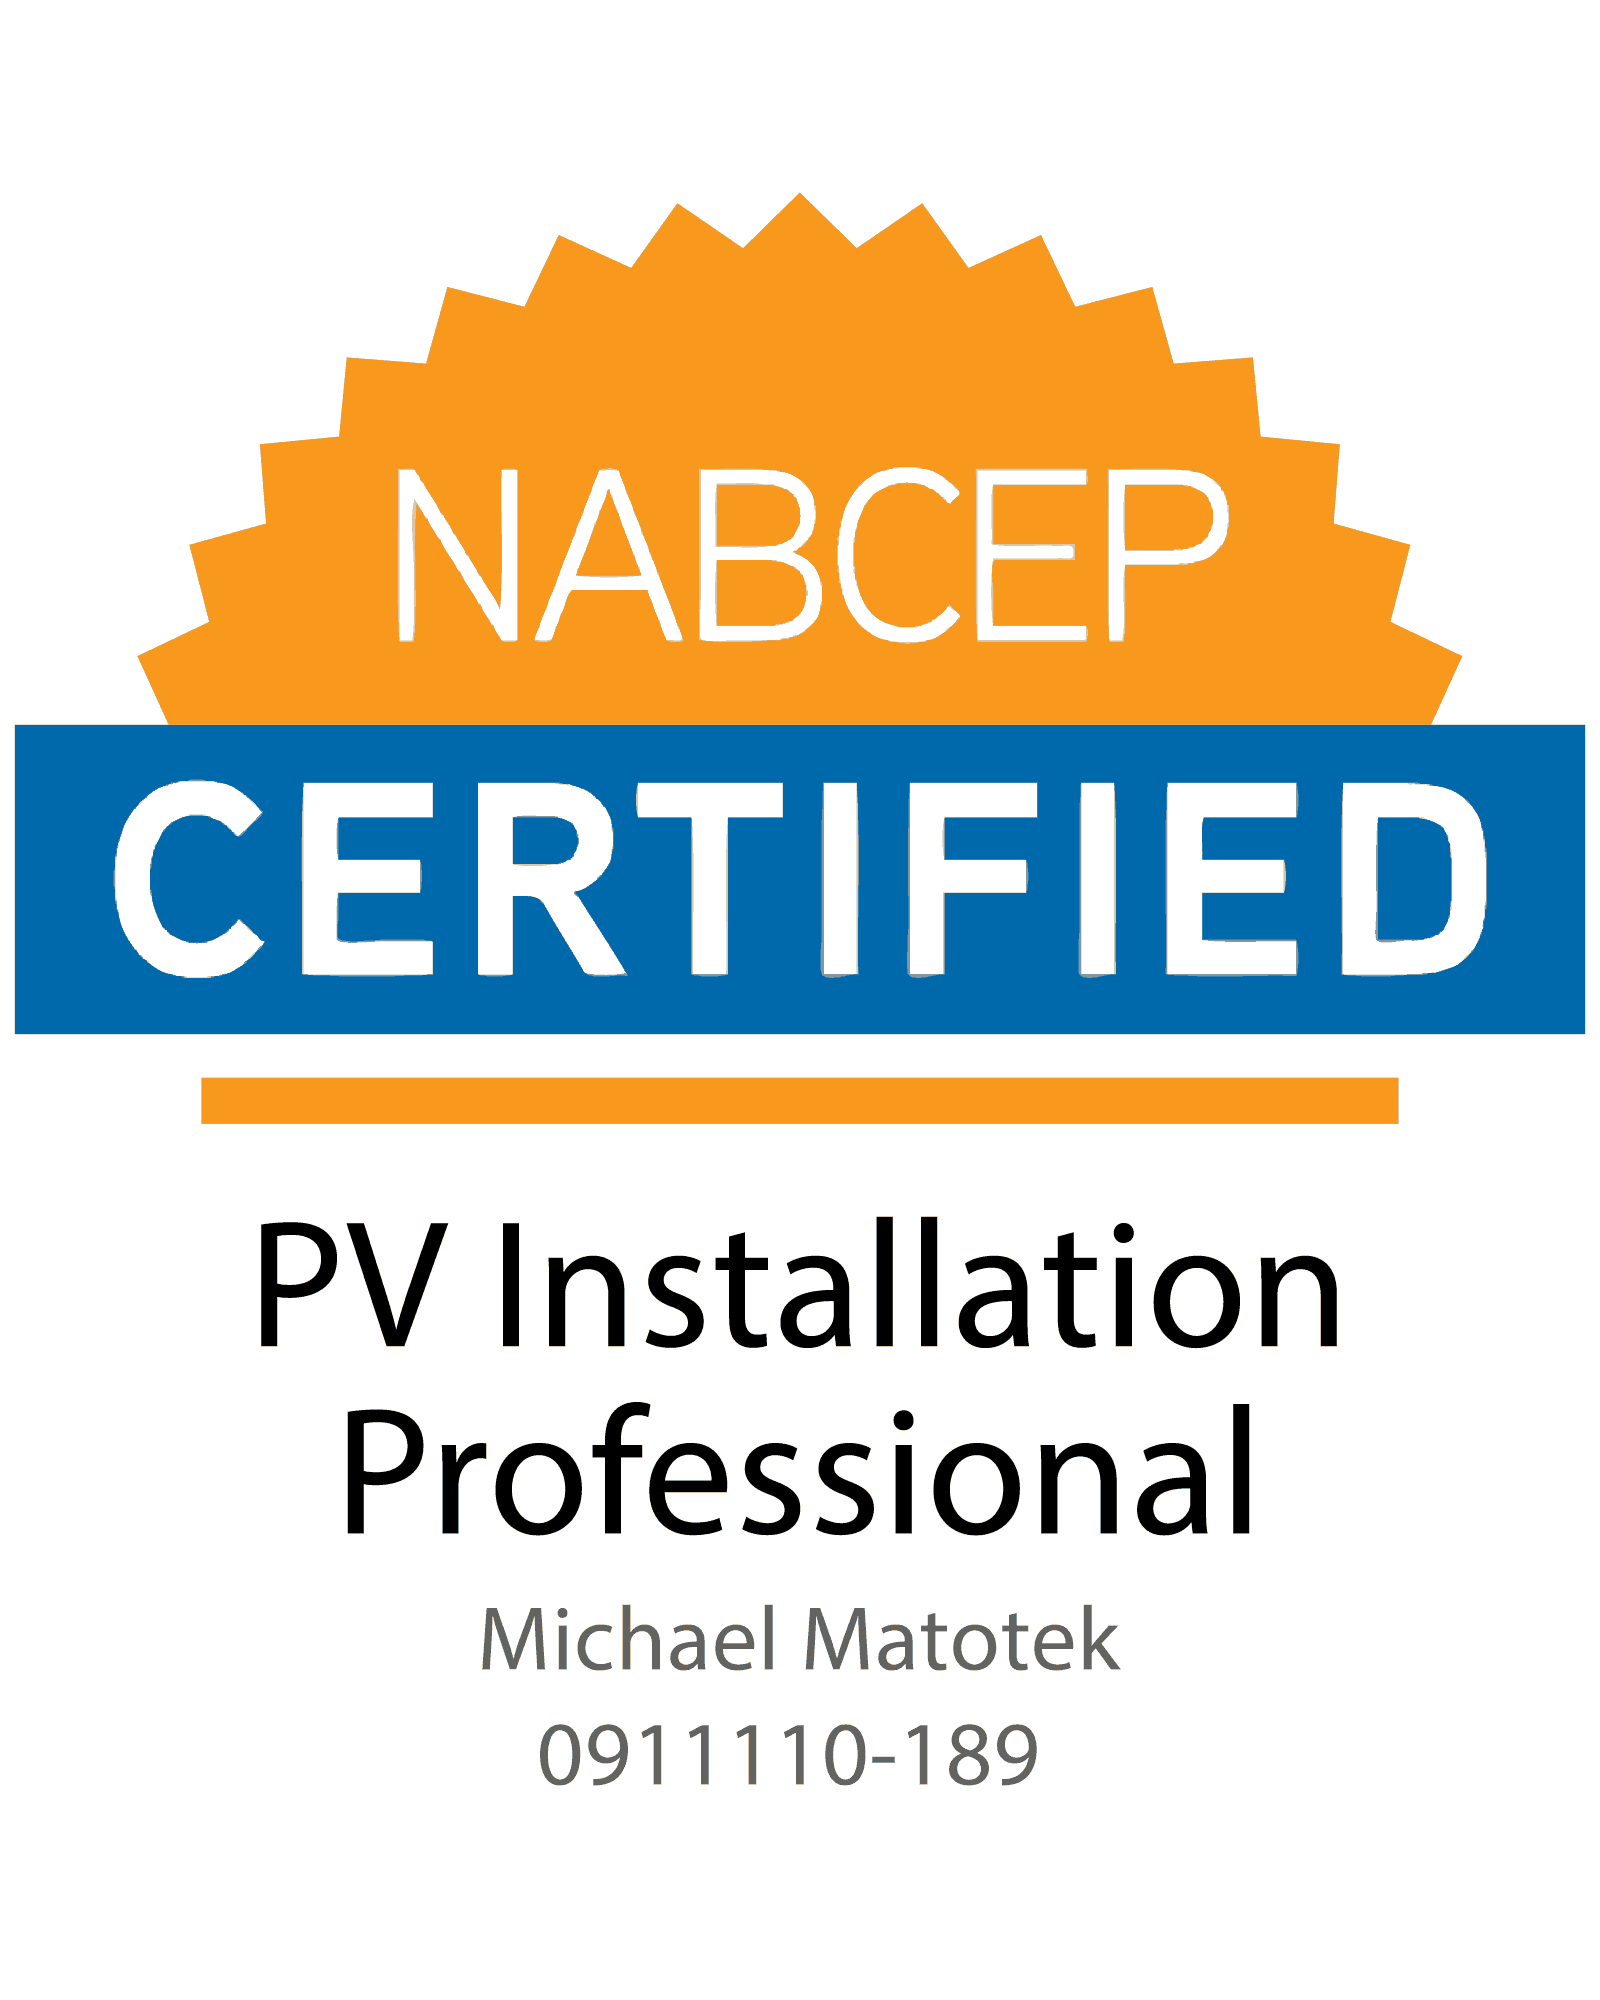 NABCEP Certified PV Installation Professional Michael Matotek 0911110-189